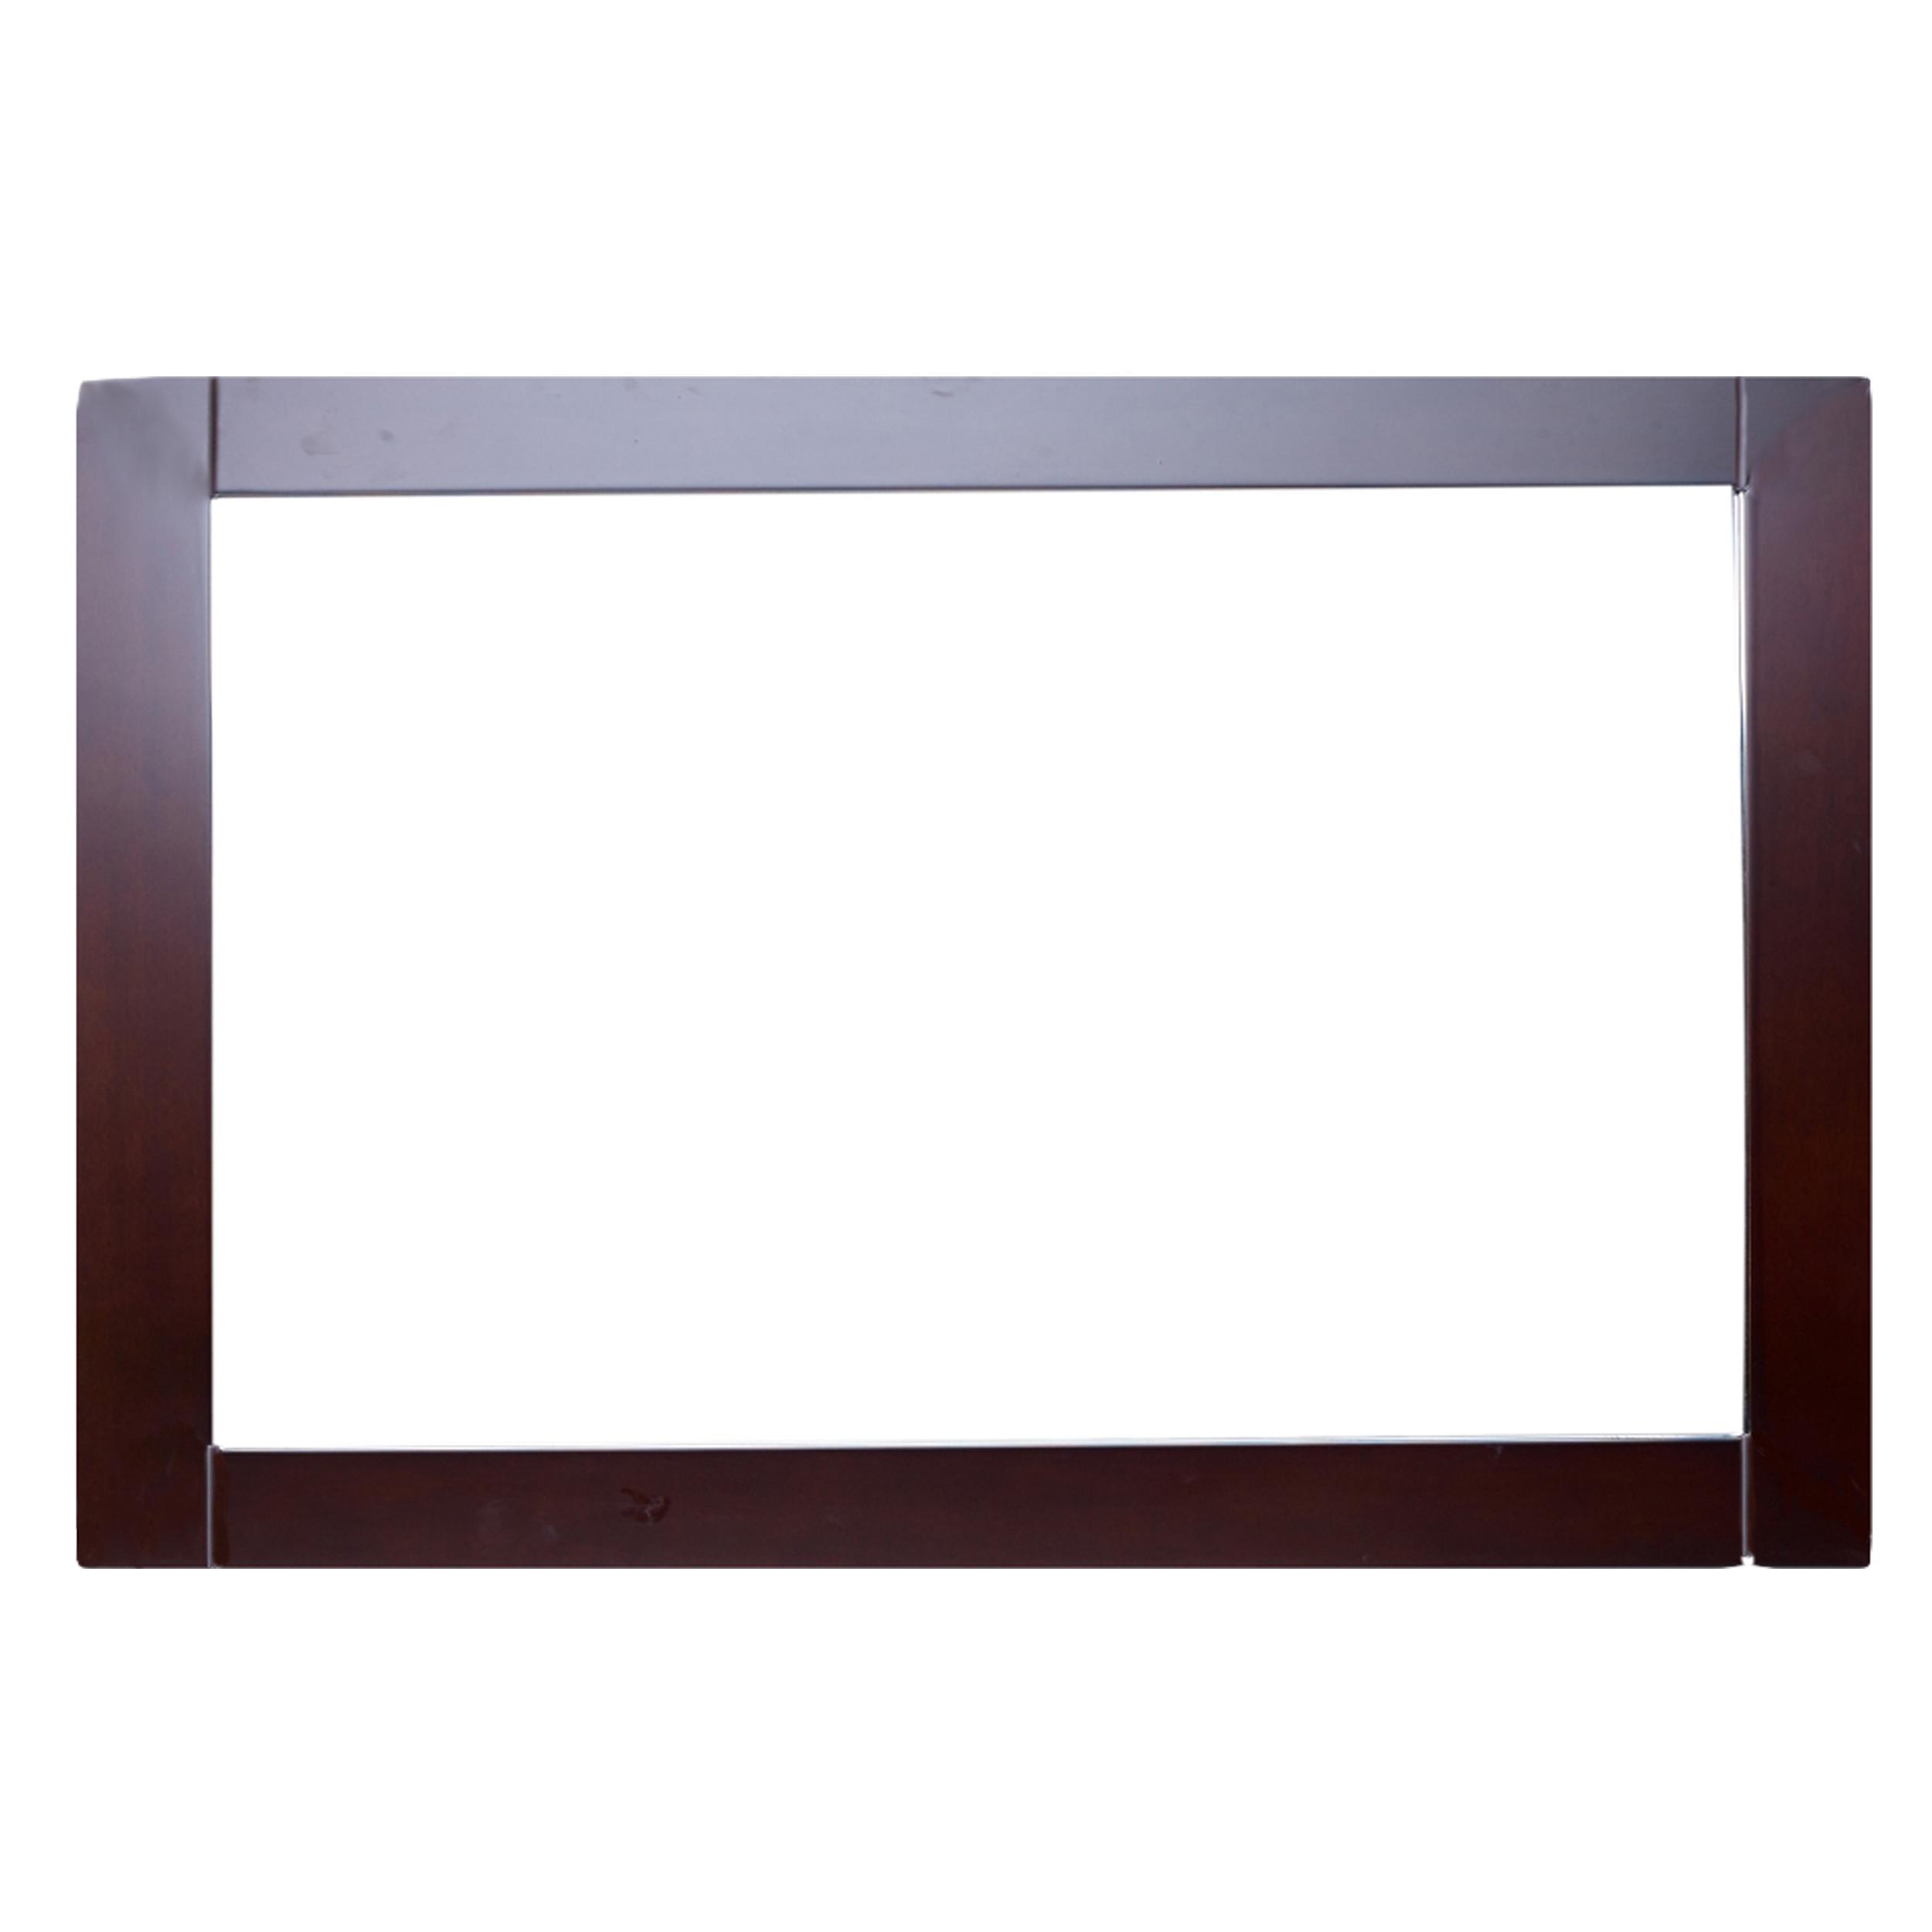 "EVMR412 36X30 TK A Main - Eviva Aberdeen 36"" Teak Framed Bathroom Wall Mirror"